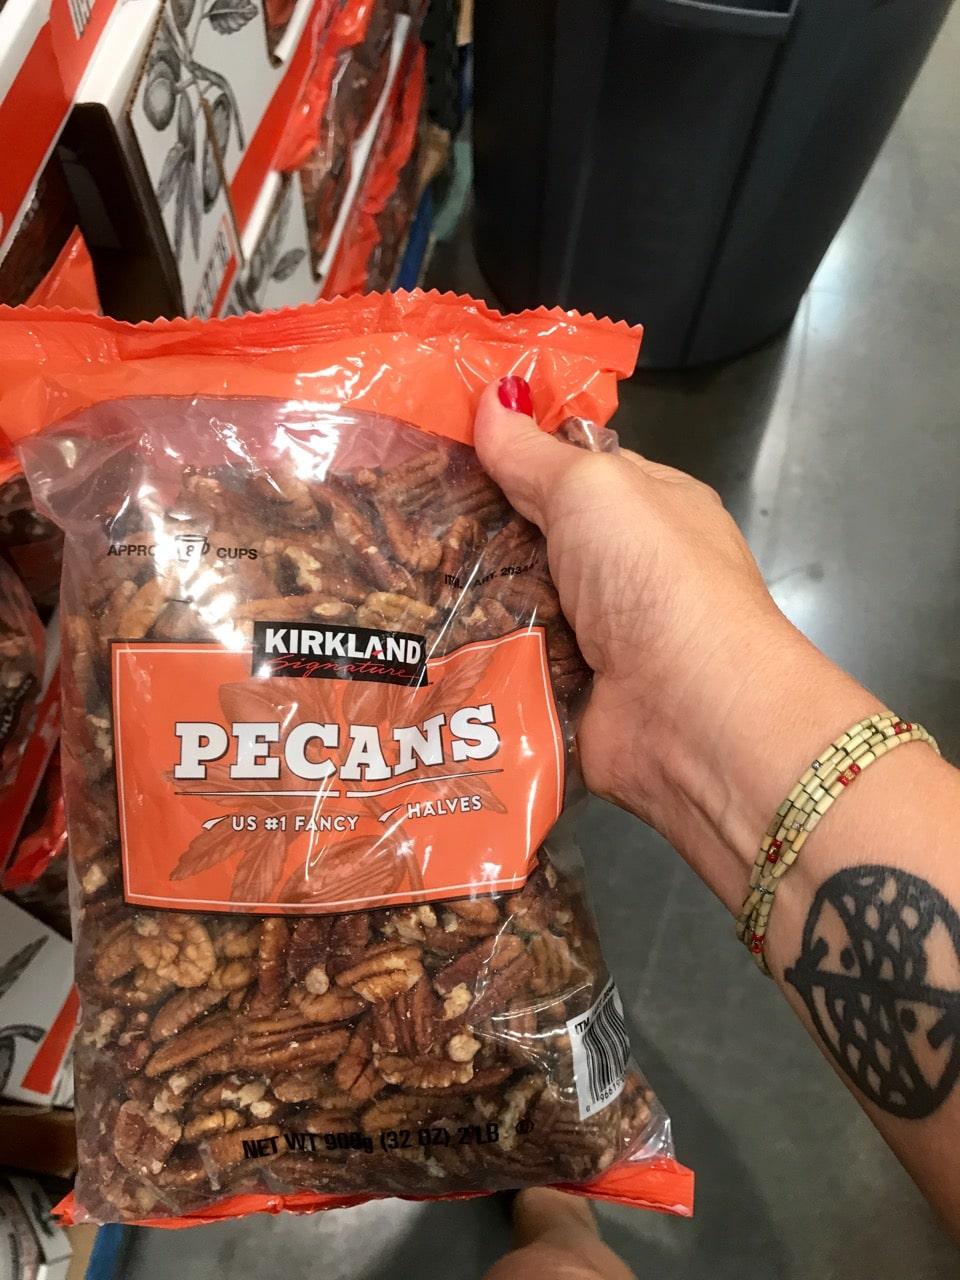 Love these Kirkland Pecans to use in my Vegan Pecan Pies